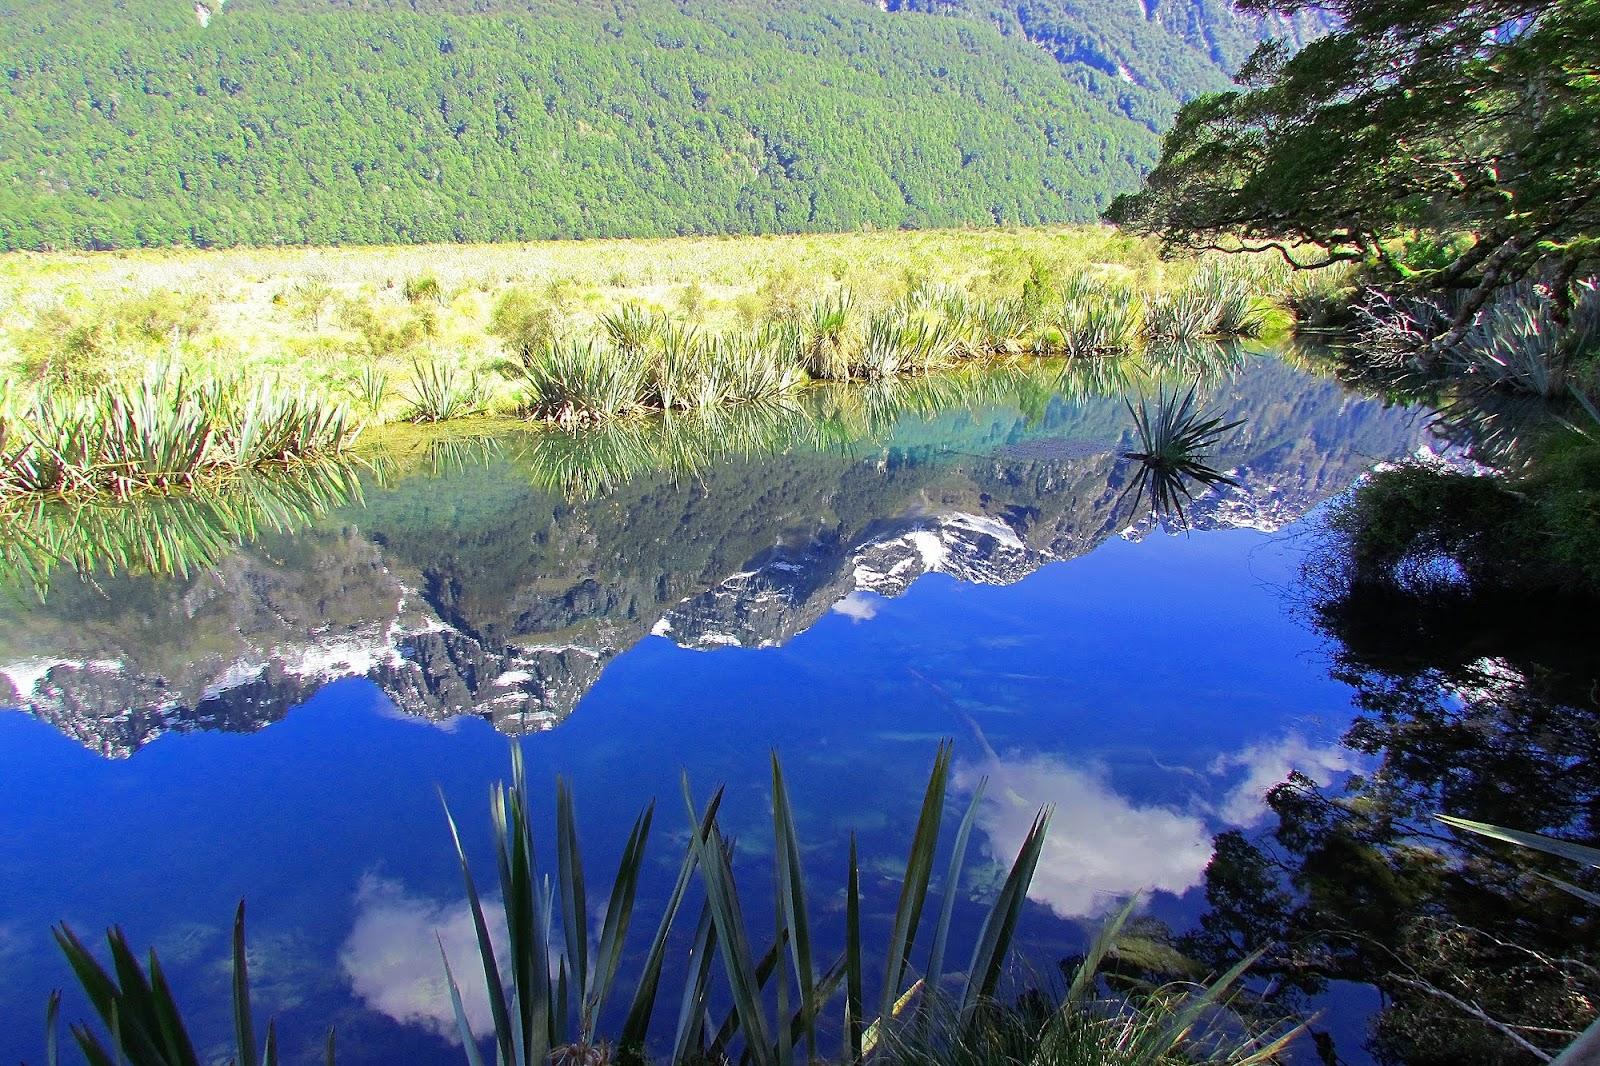 Milford Sound Stream Reflection 2.jpg